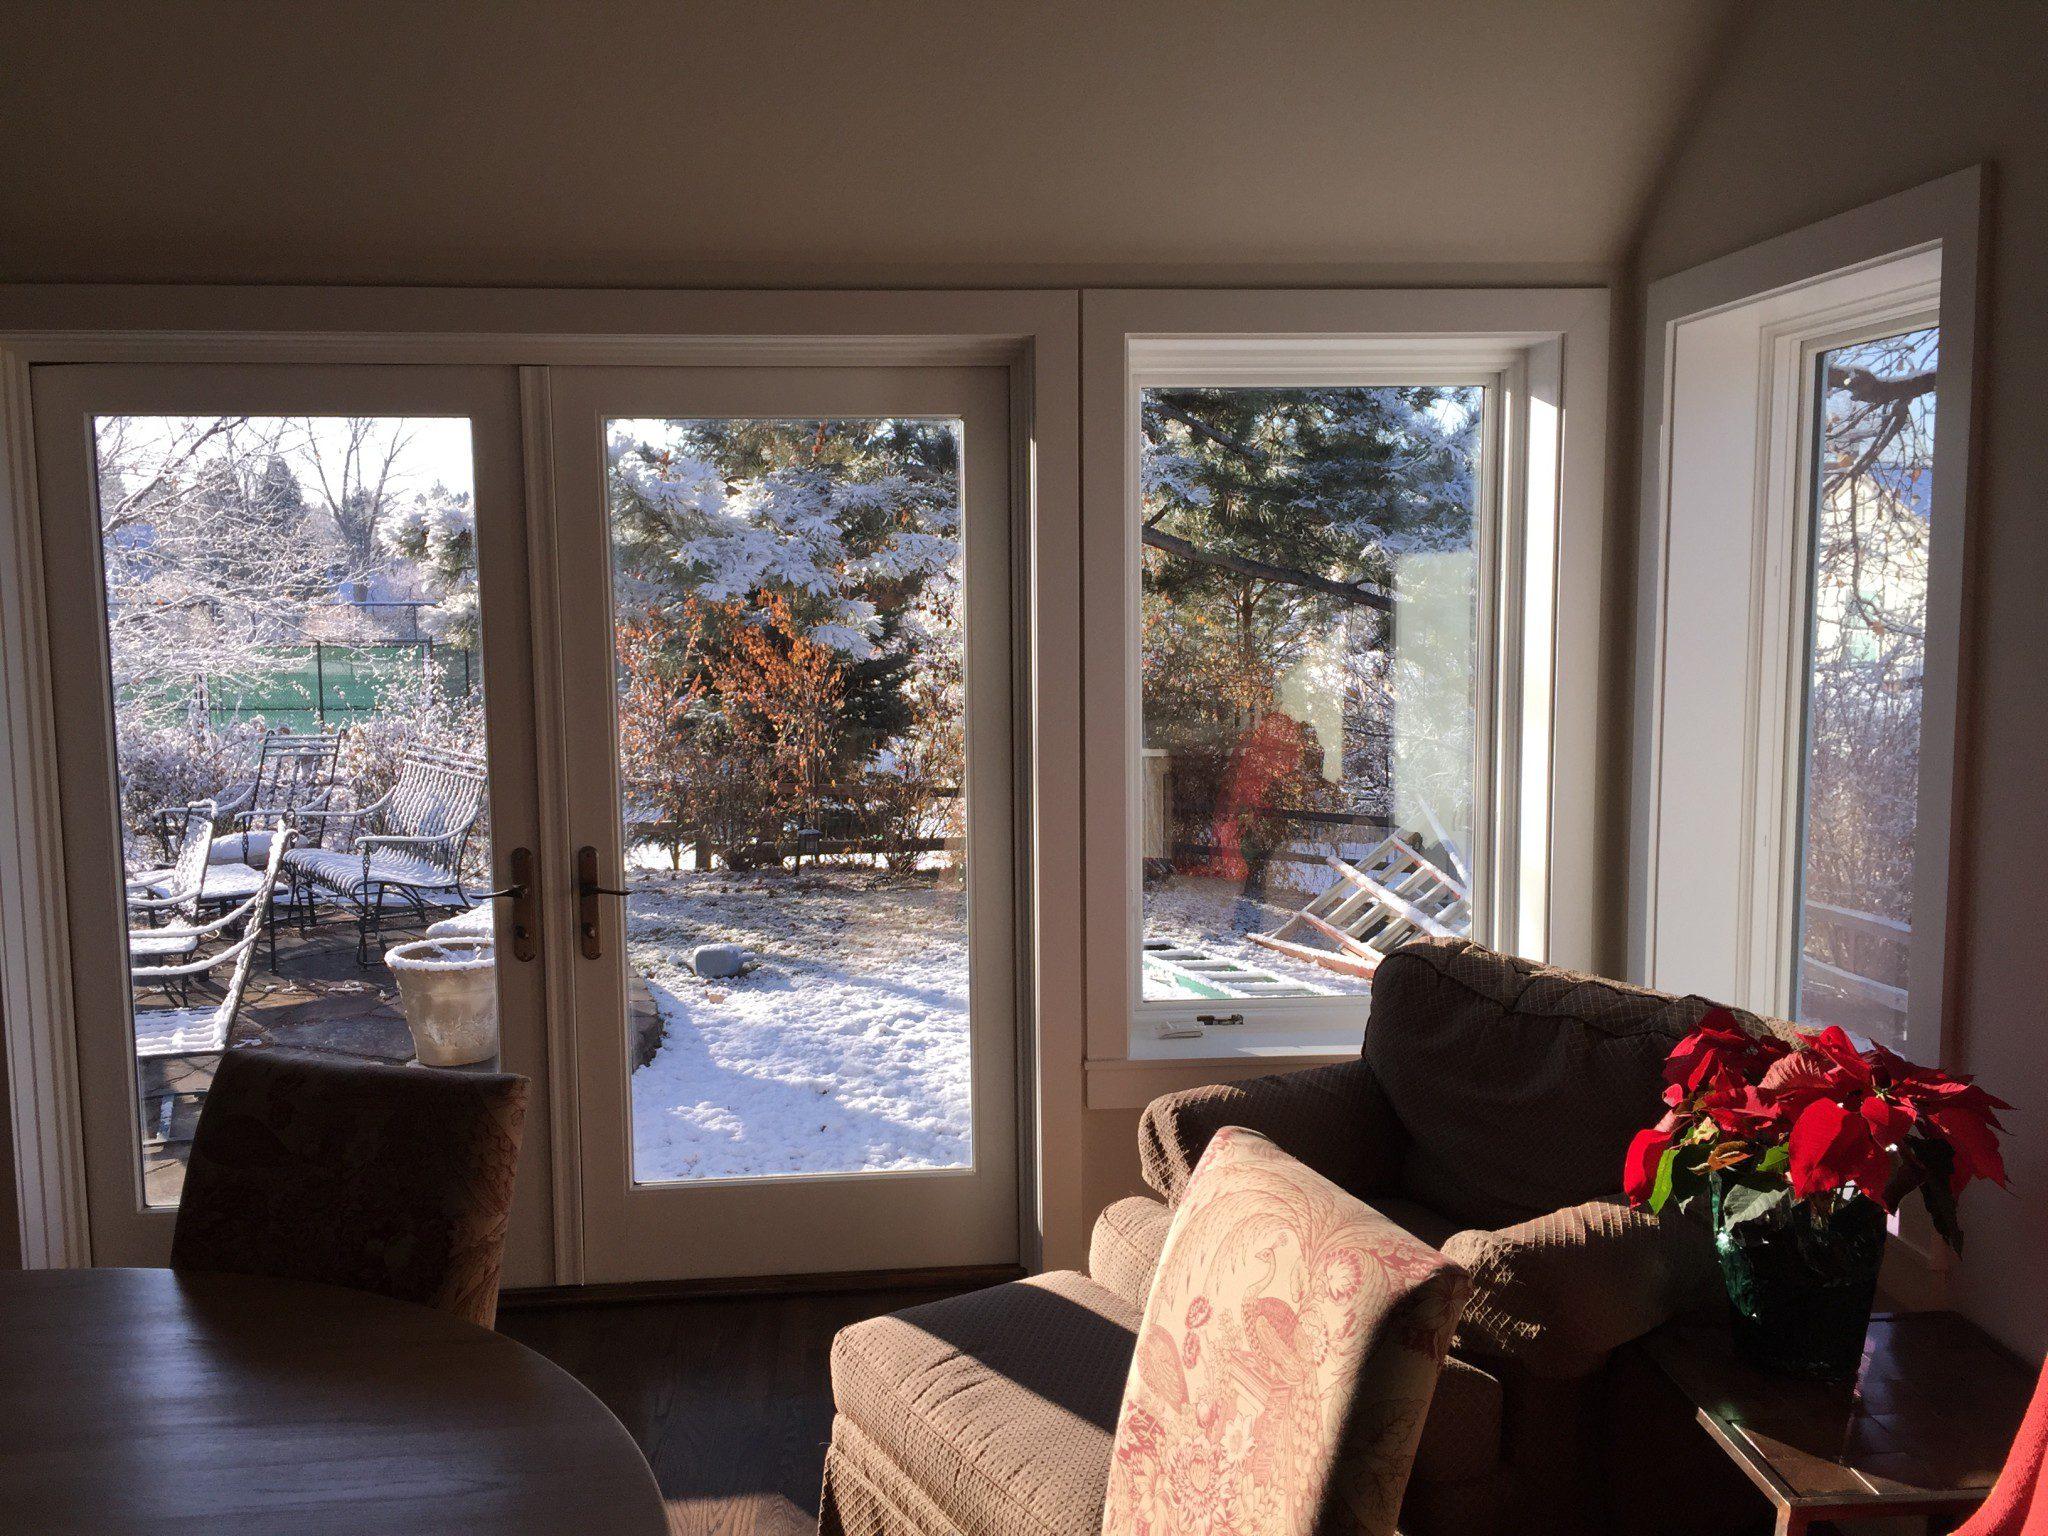 Pella Architect Windows and Doors